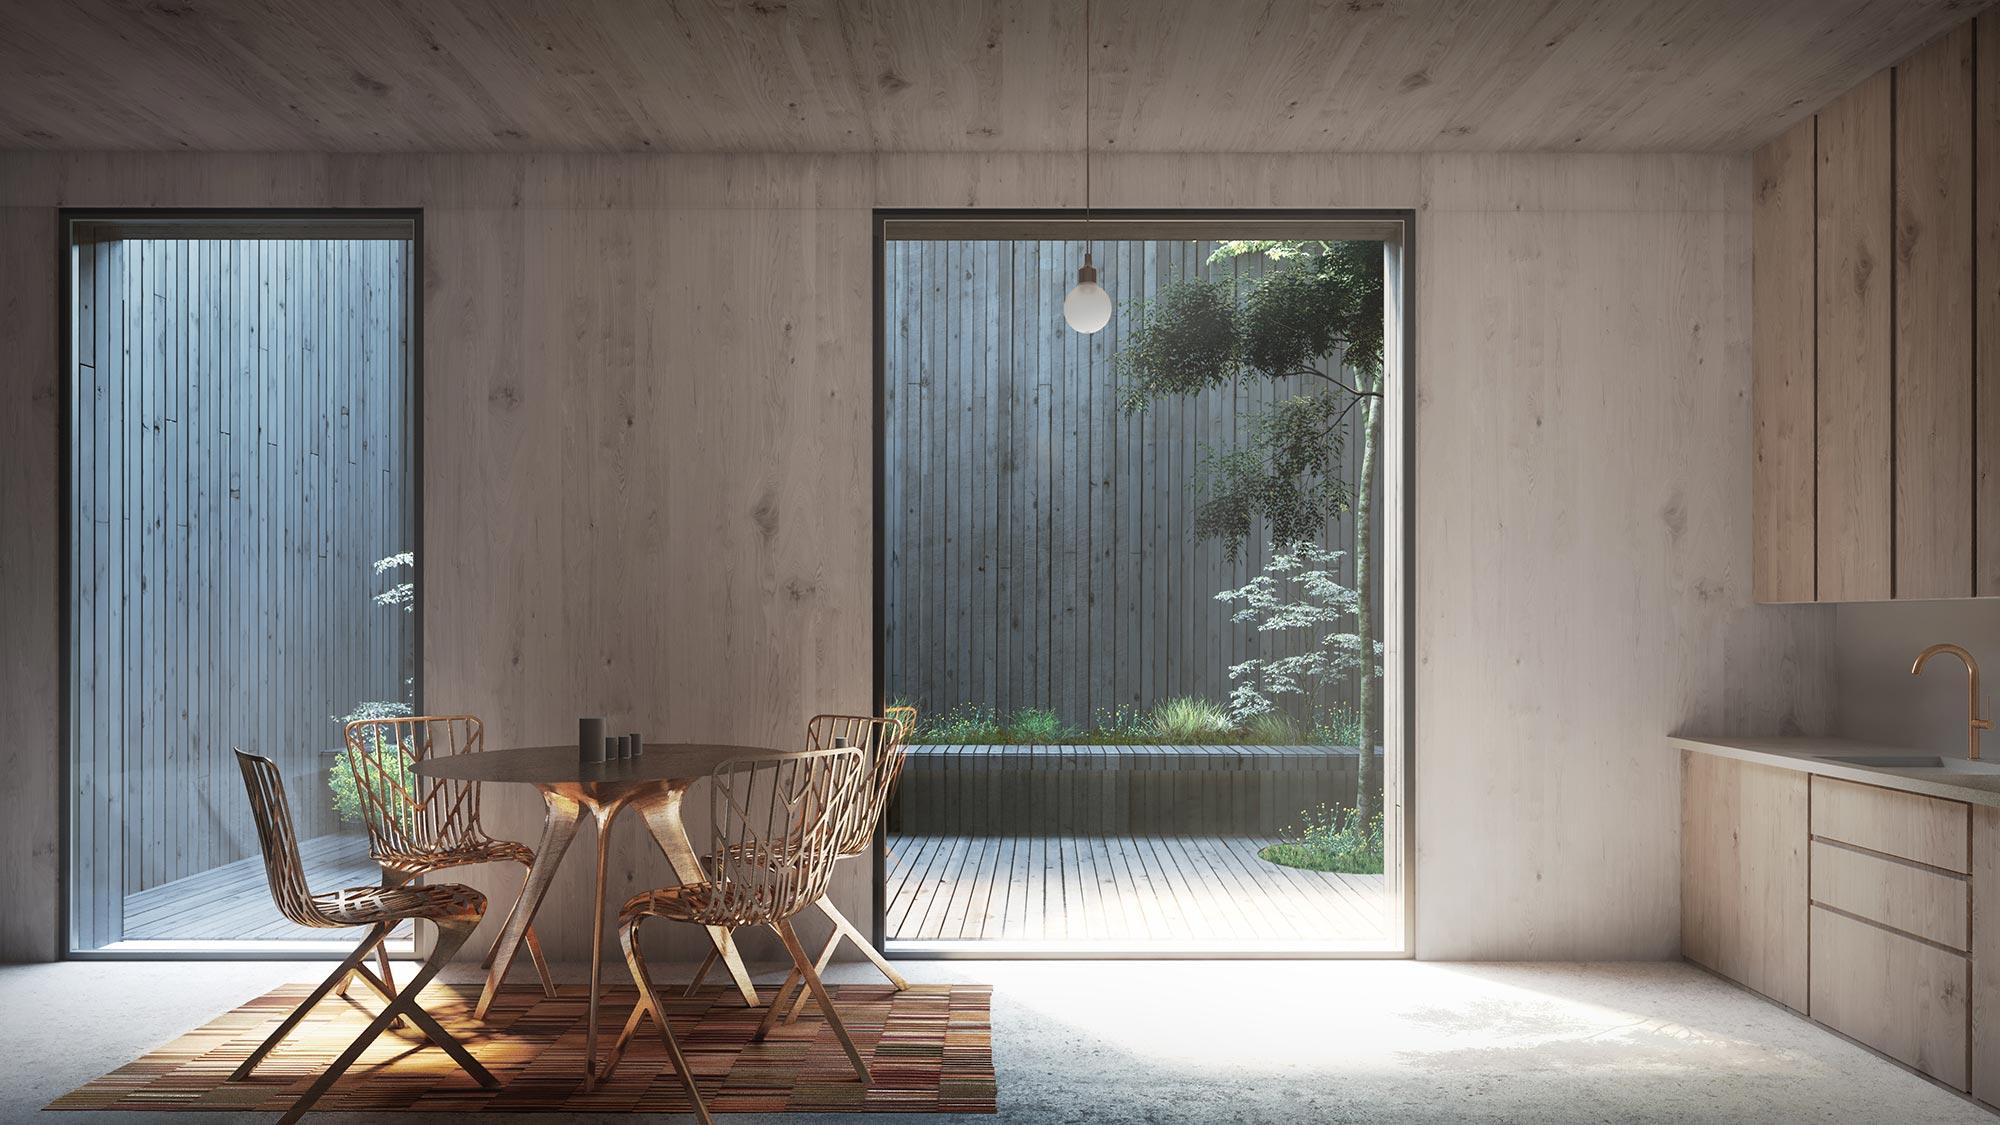 cube-haus-adjaye-associates-architects-cs-2000px-03